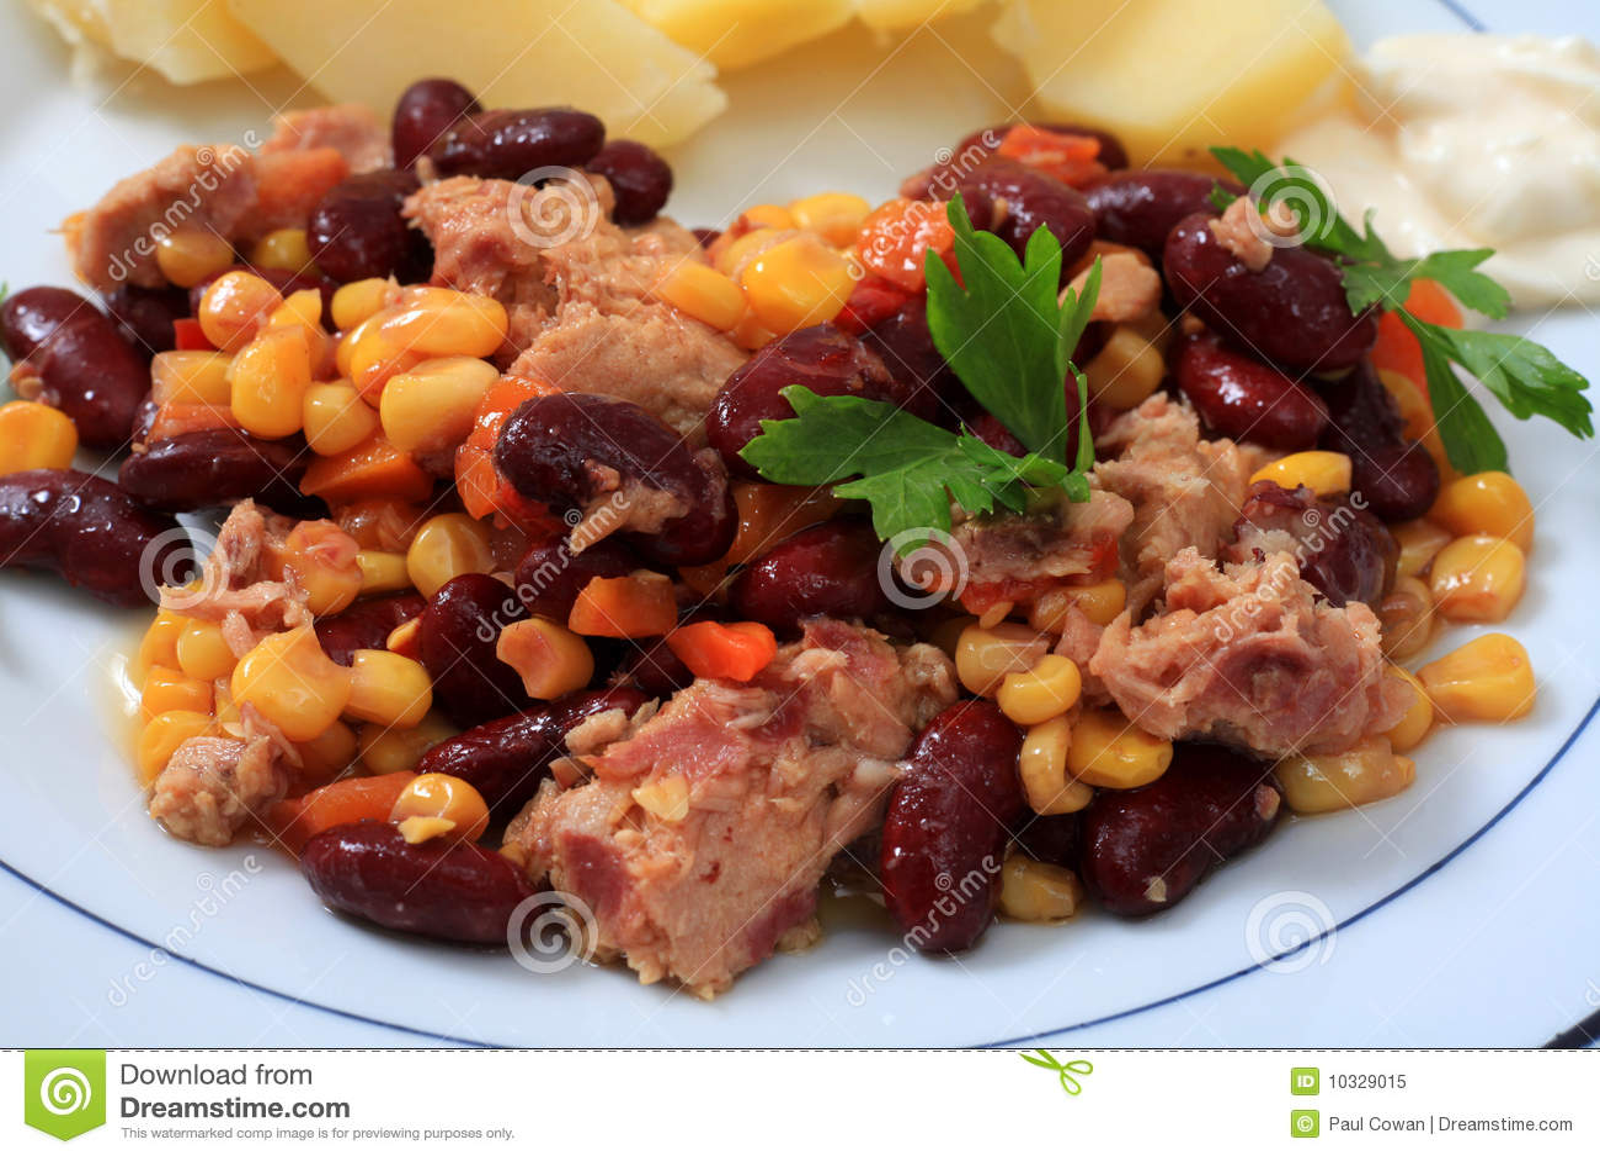 Tuna salad close-up